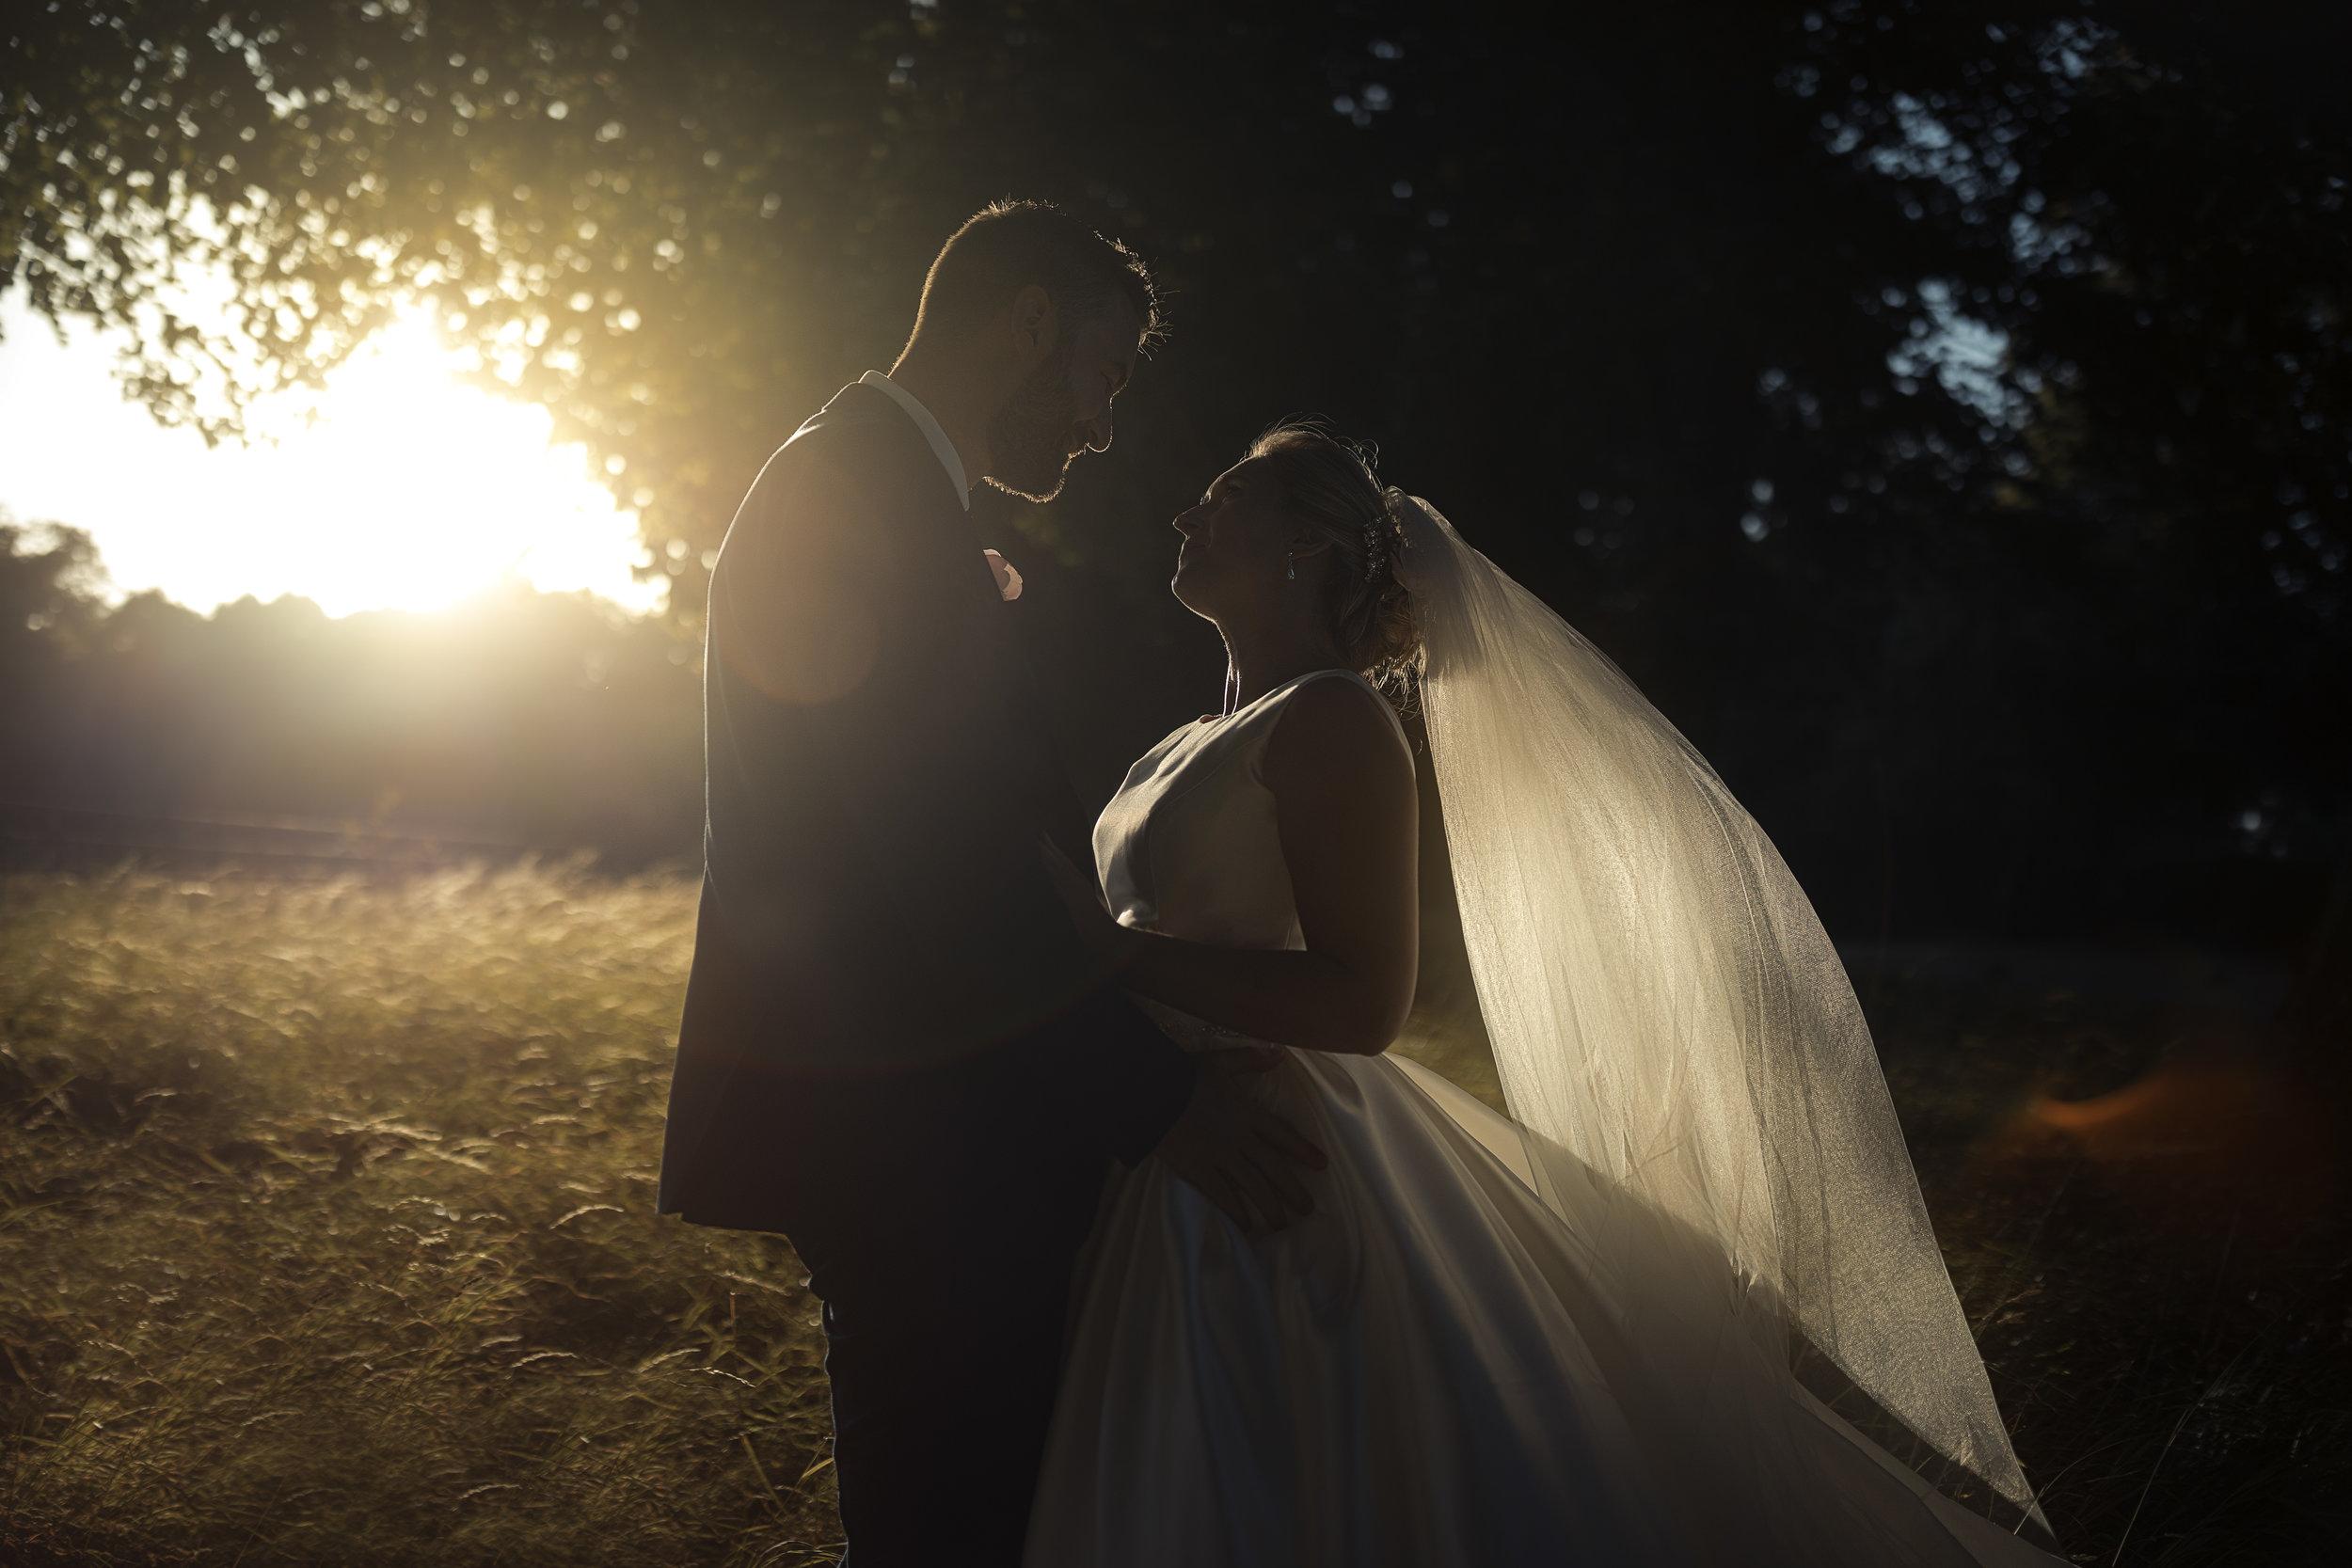 london wedding photographer james davies.jpg